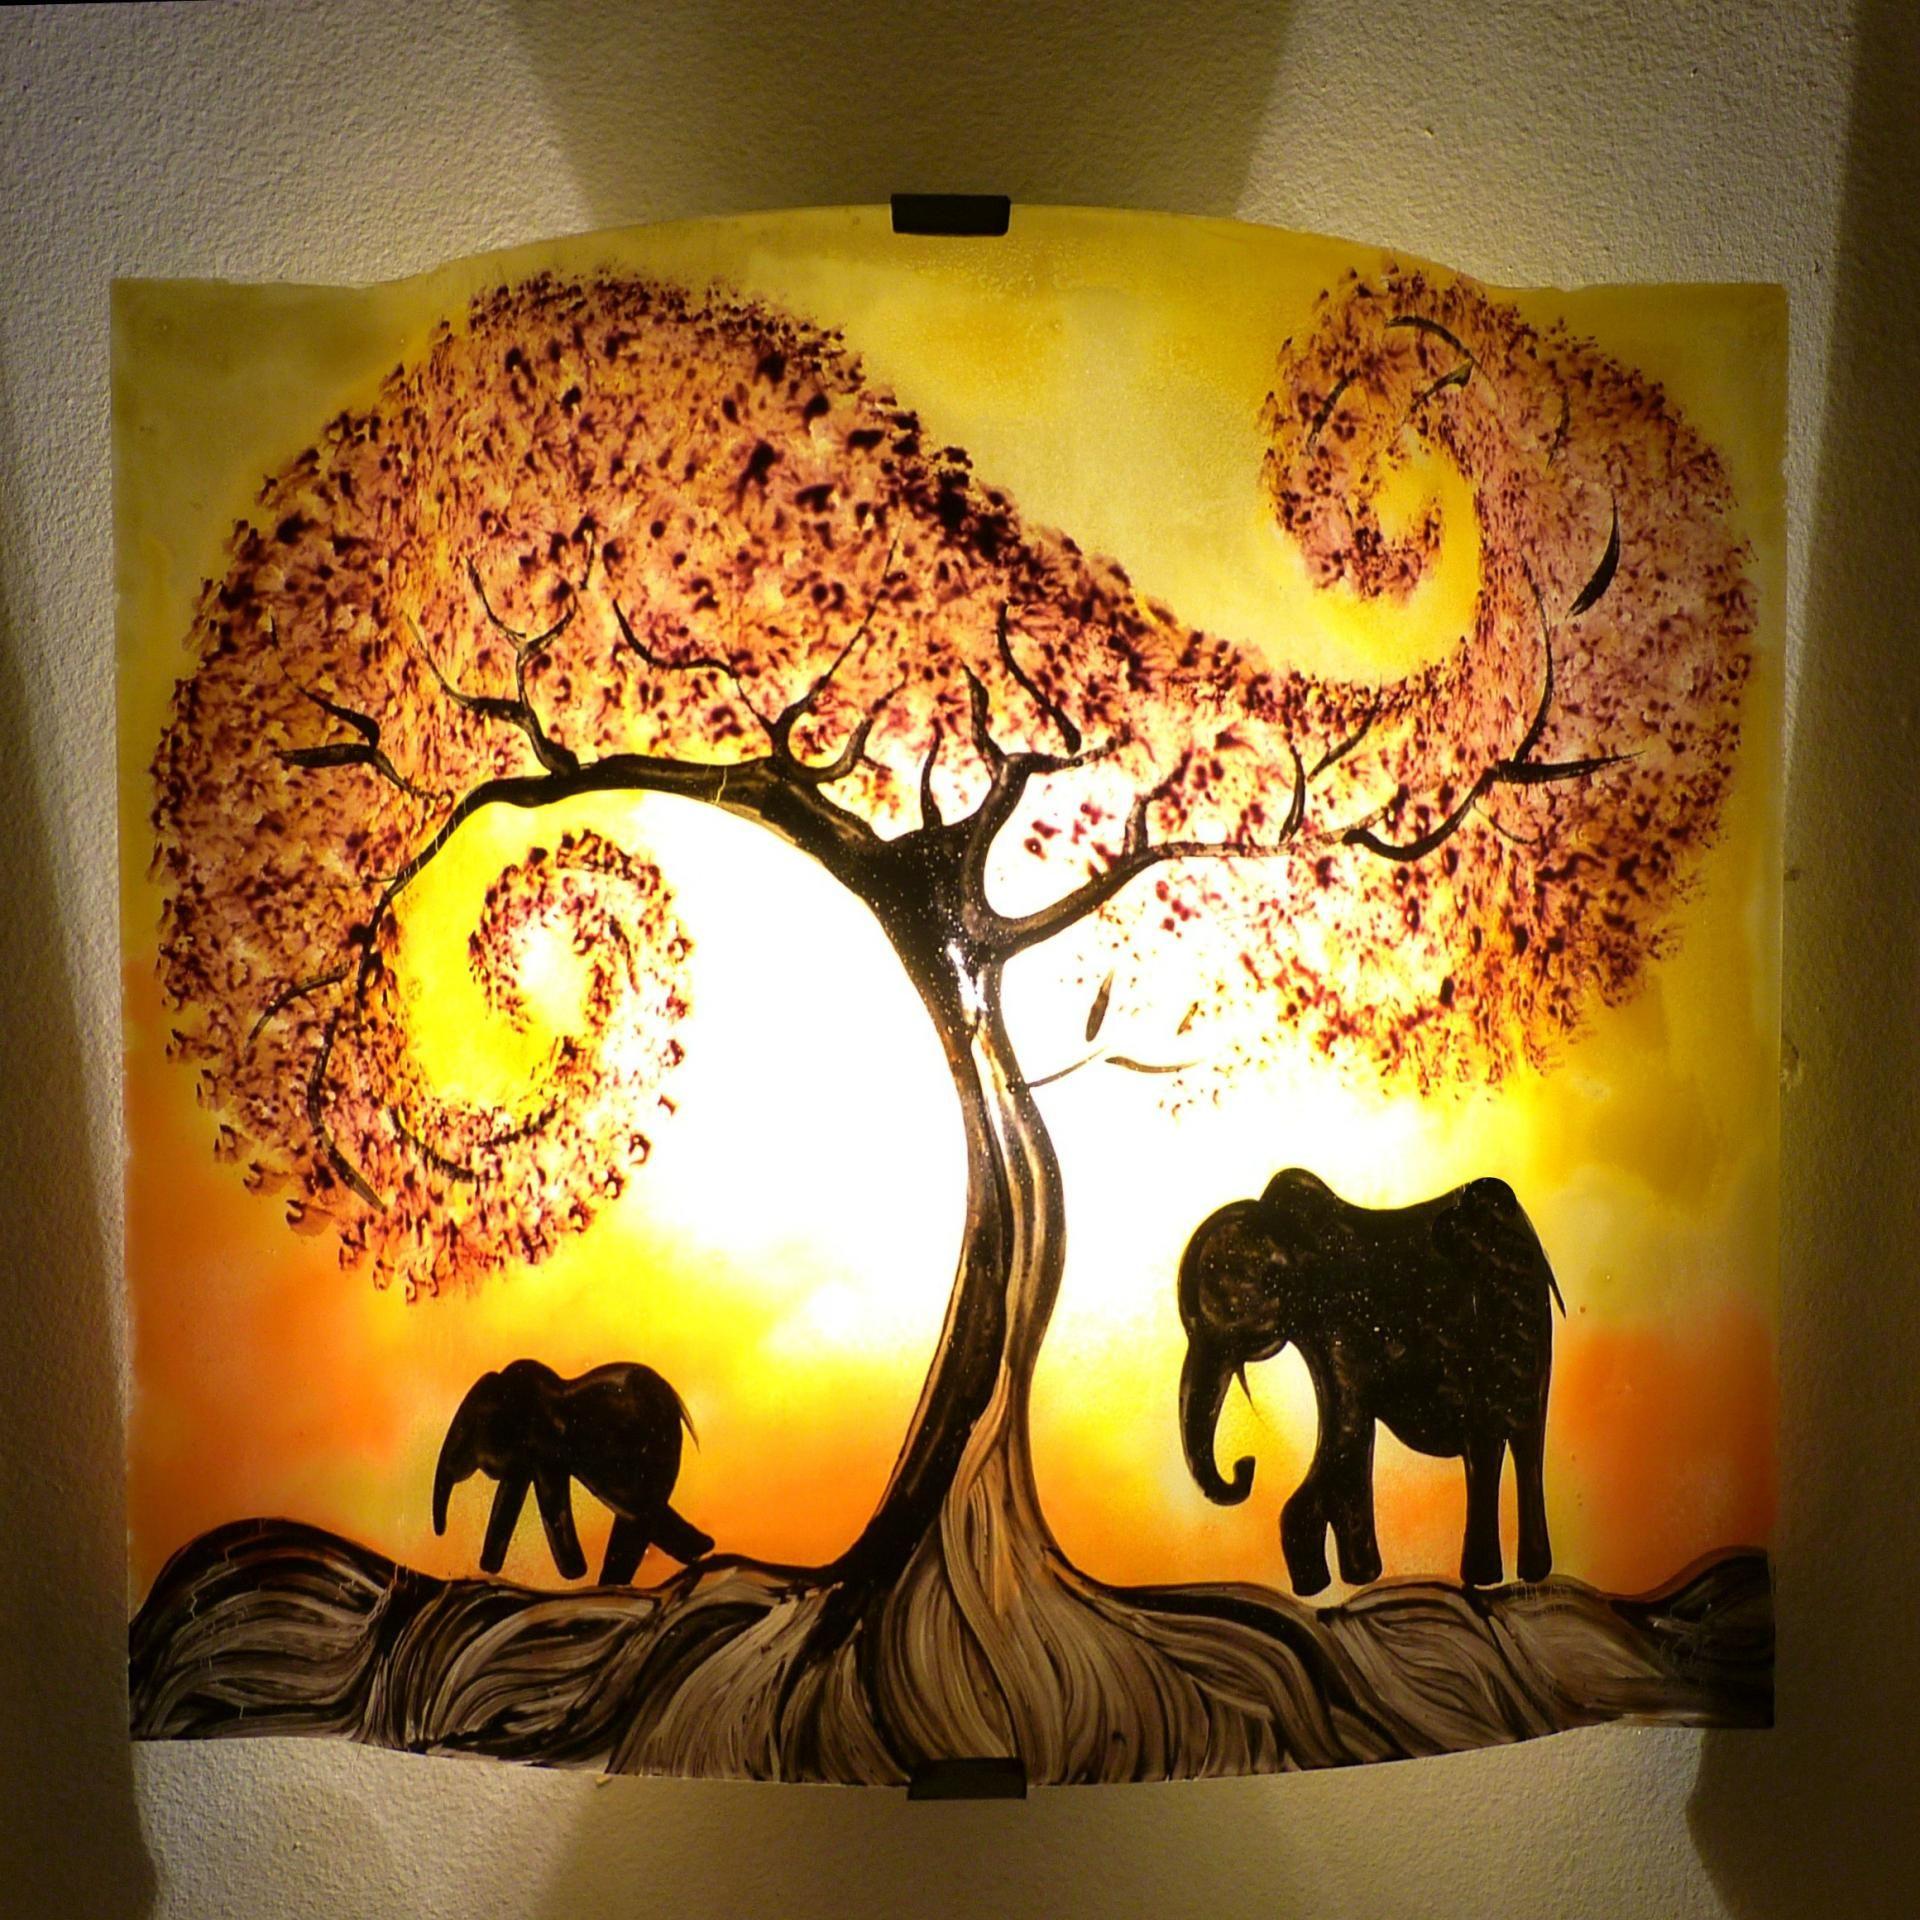 applique murale luminaire jaune et orange motif l phant luminaire peinture sur verre. Black Bedroom Furniture Sets. Home Design Ideas